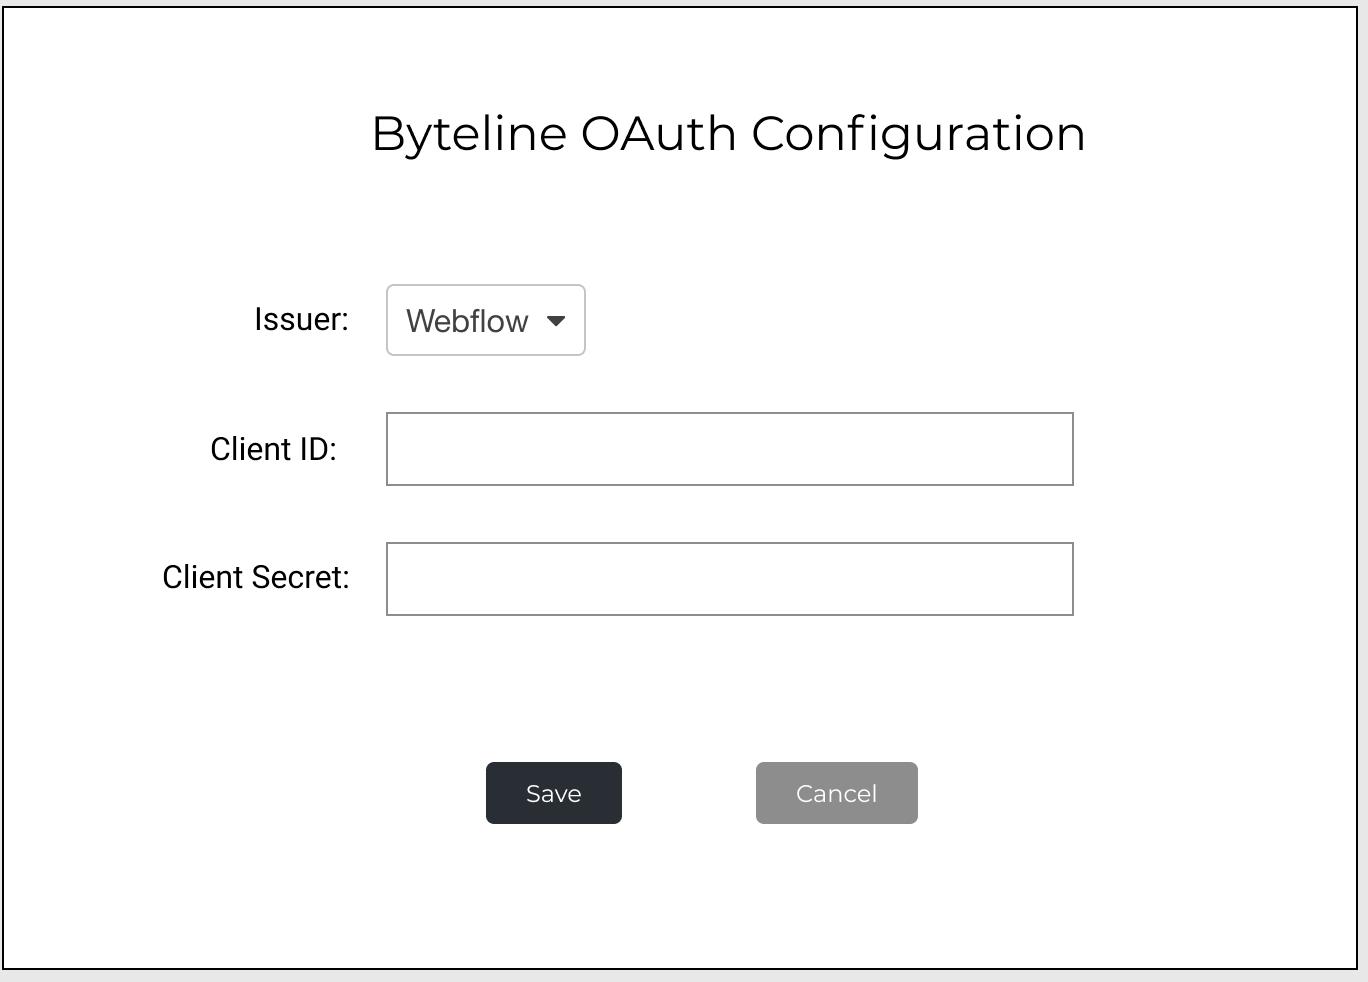 Byteline OAuth configuration